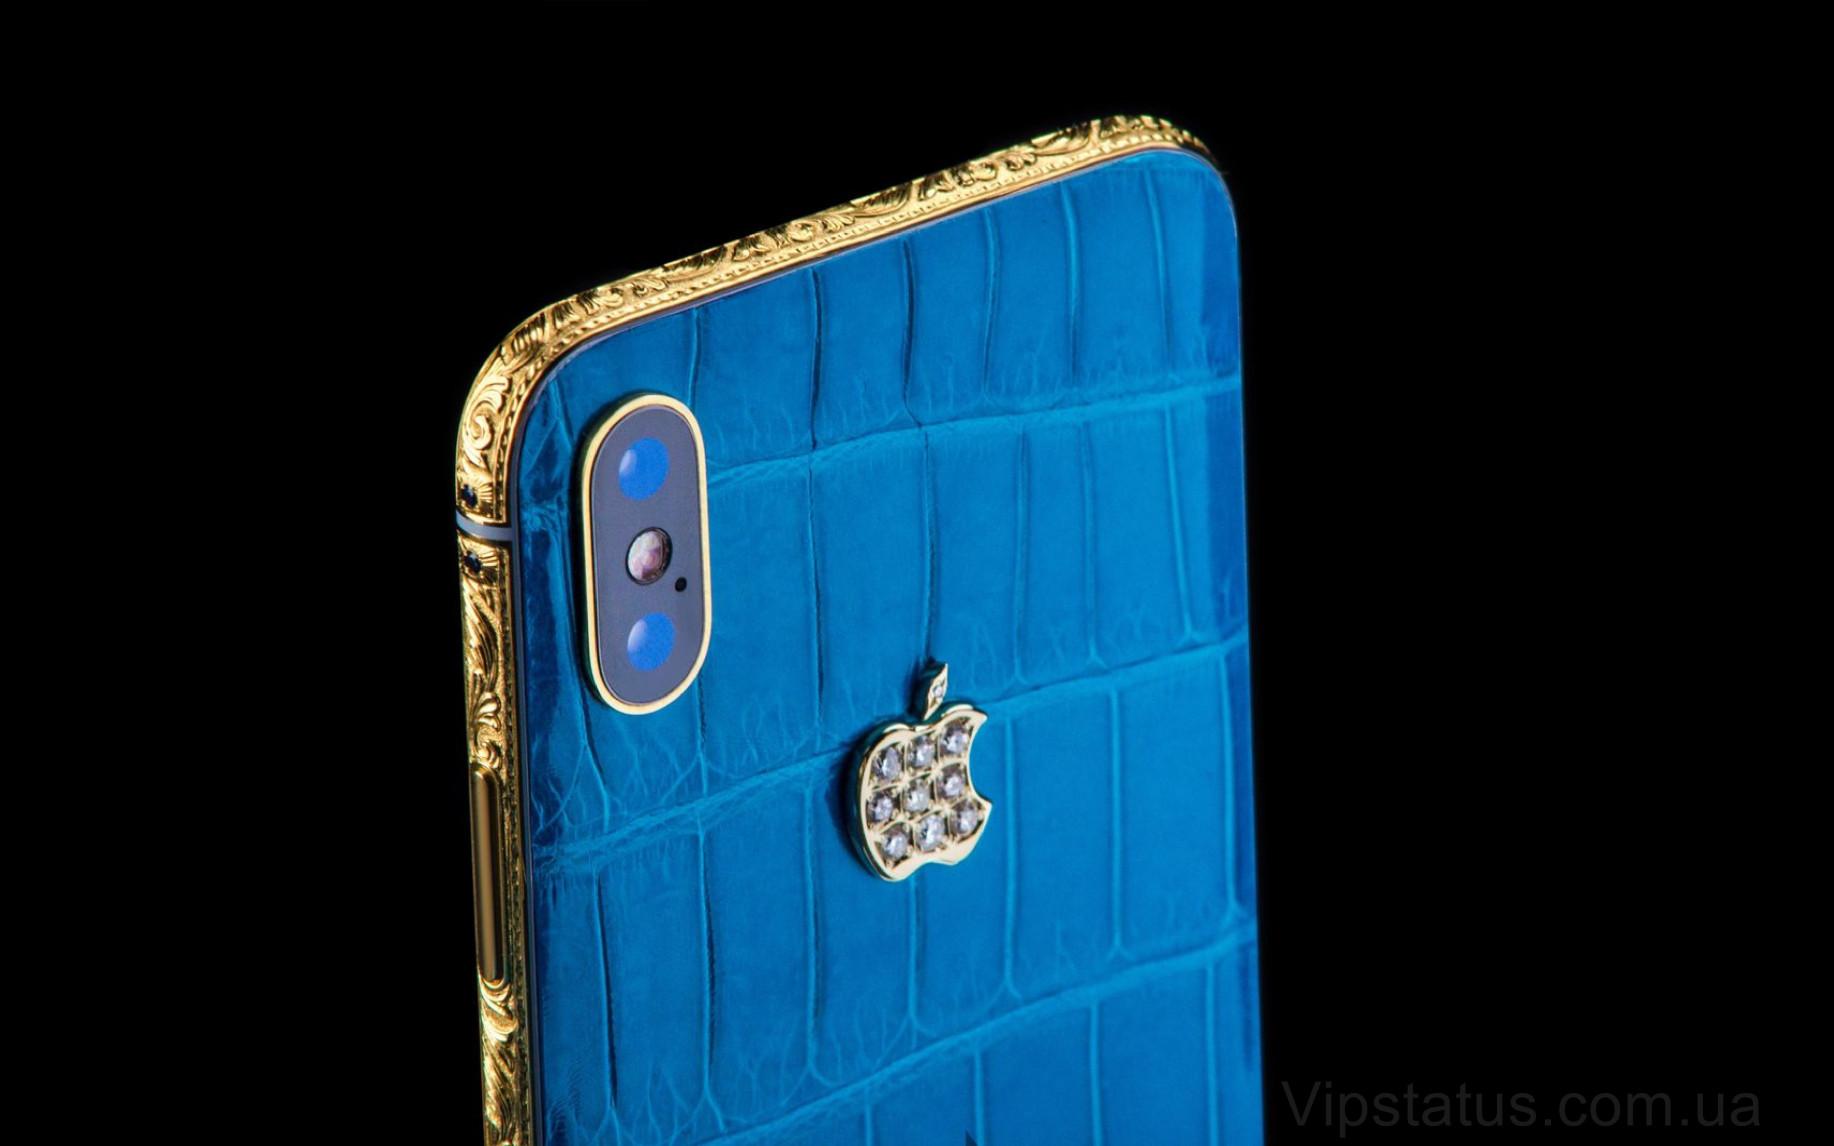 Elite Queen Diamond IPHONE XS 512 GB Queen Diamond IPHONE XS 512 GB image 4